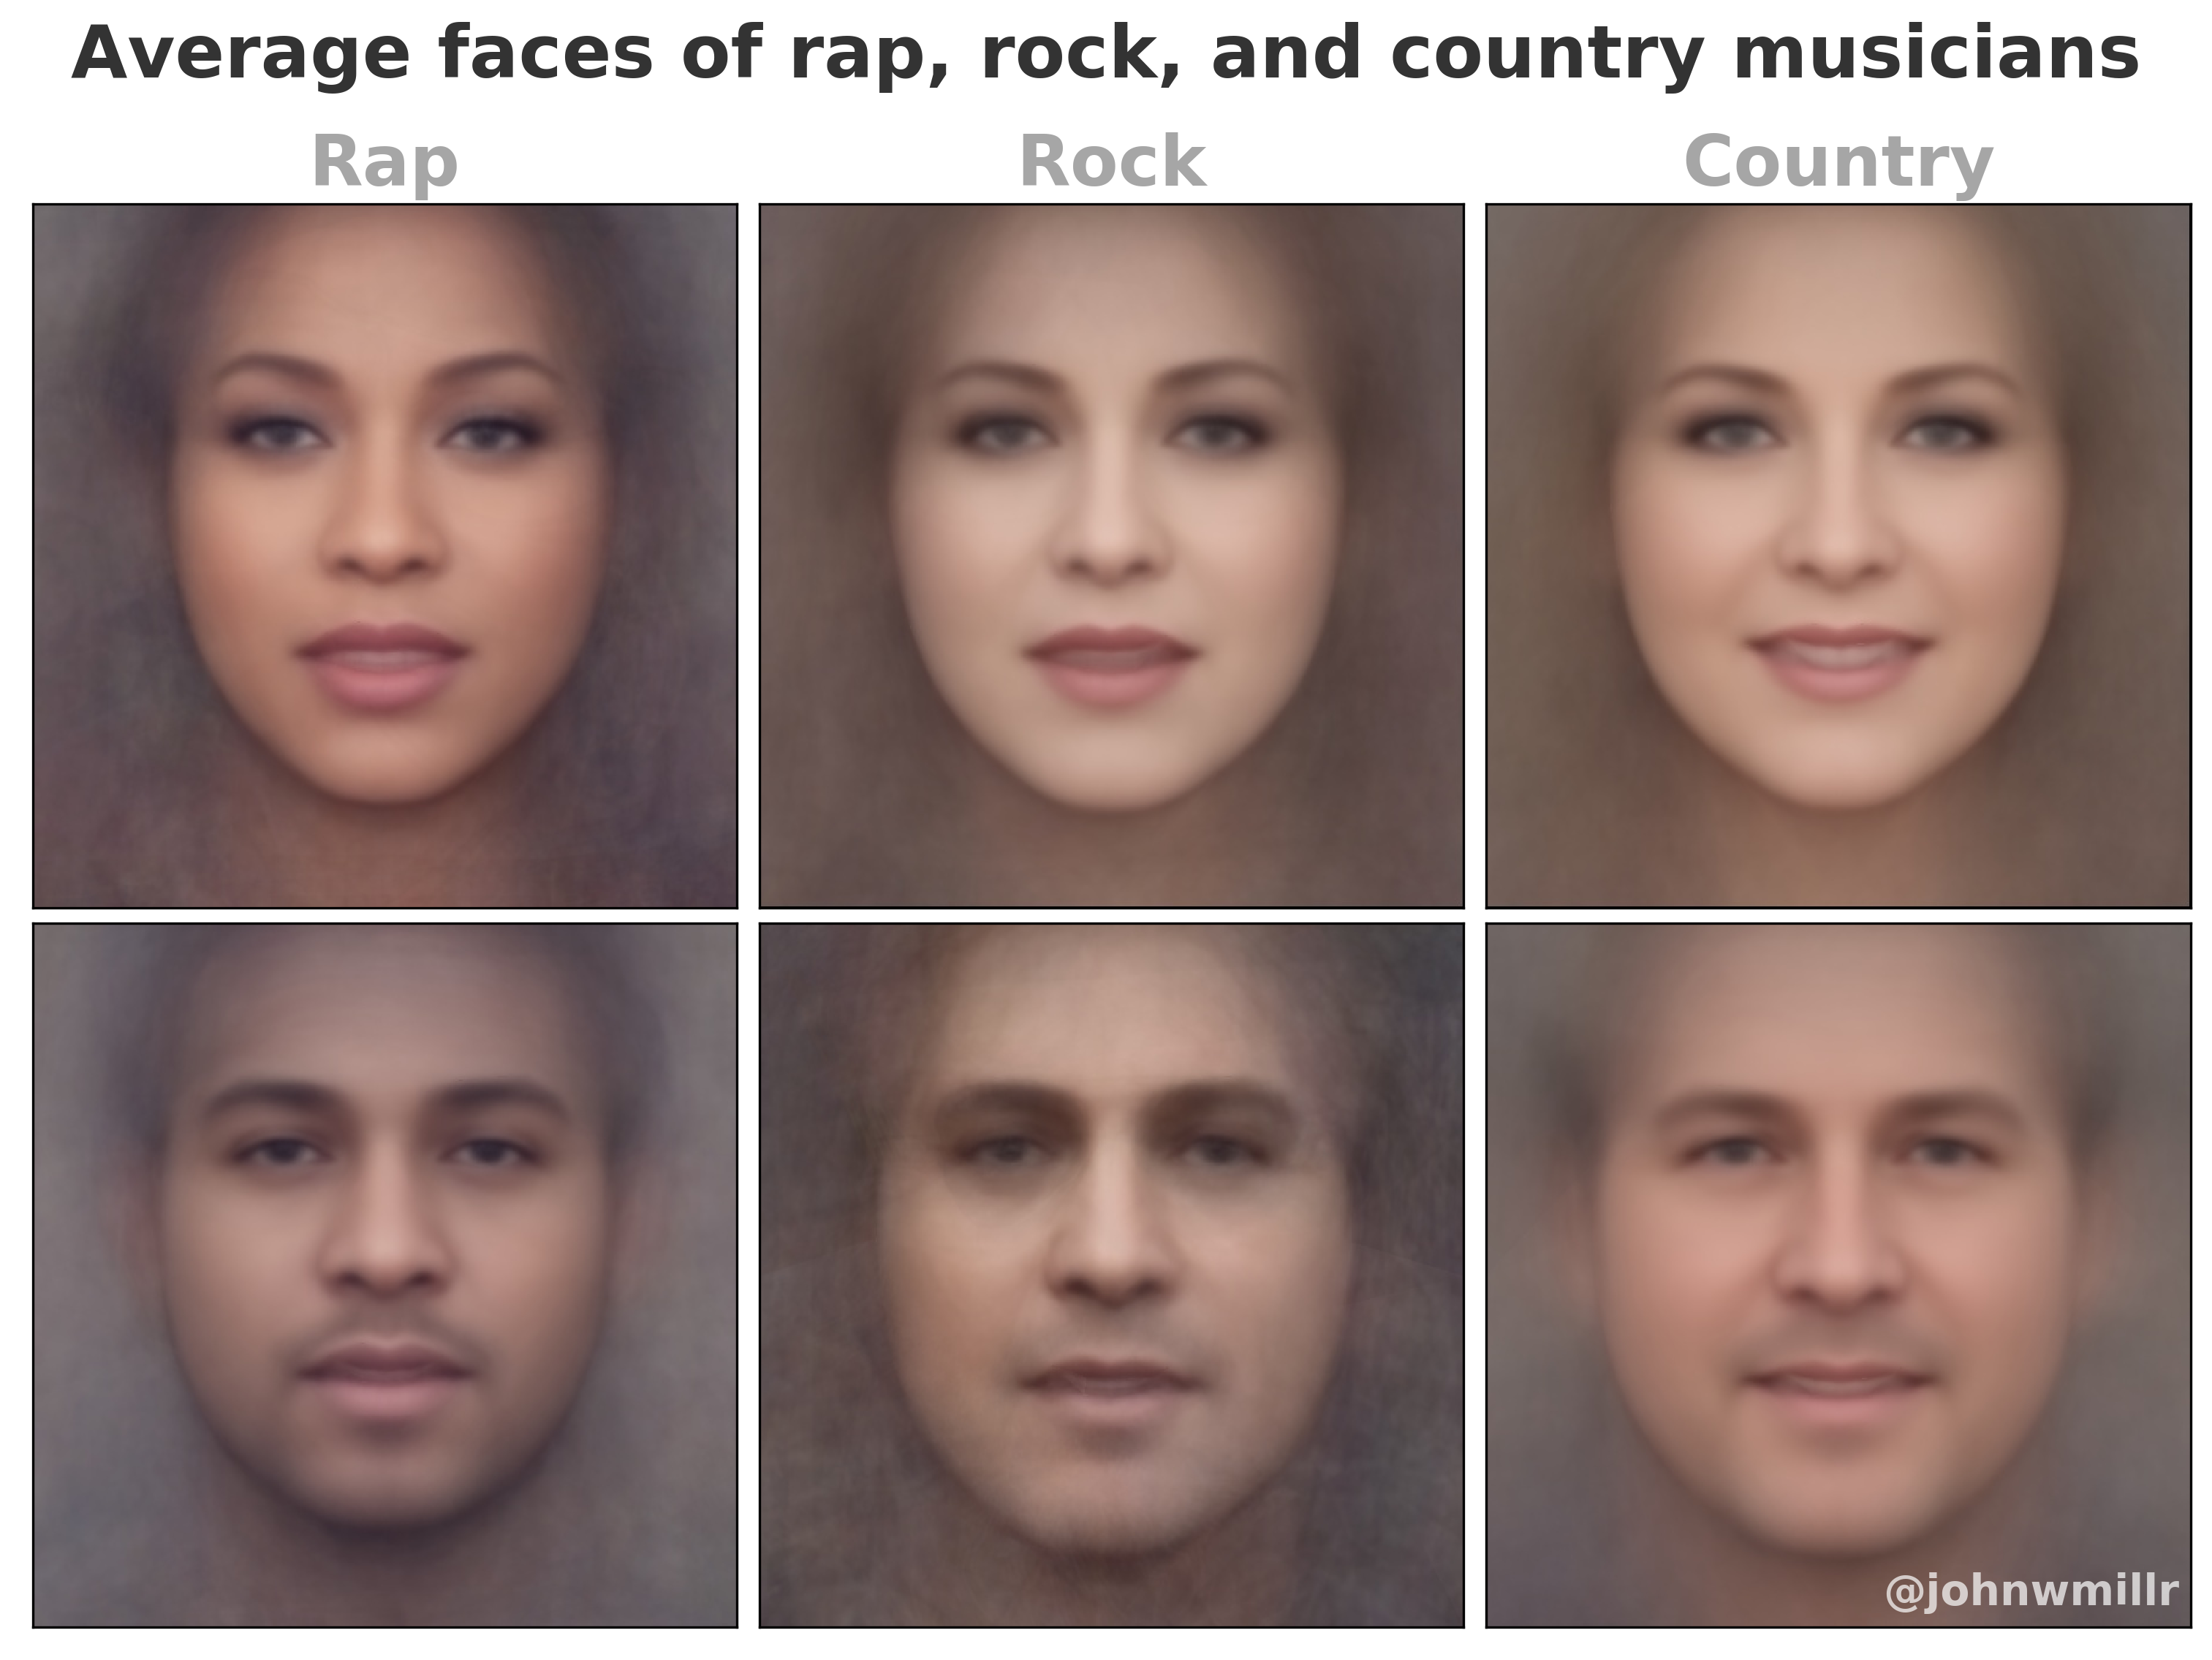 The Average Faces Of Rap Rock And Country Musicians Data Interestingdata Beautifuldata Visualdata Average Face Country Musicians Rap